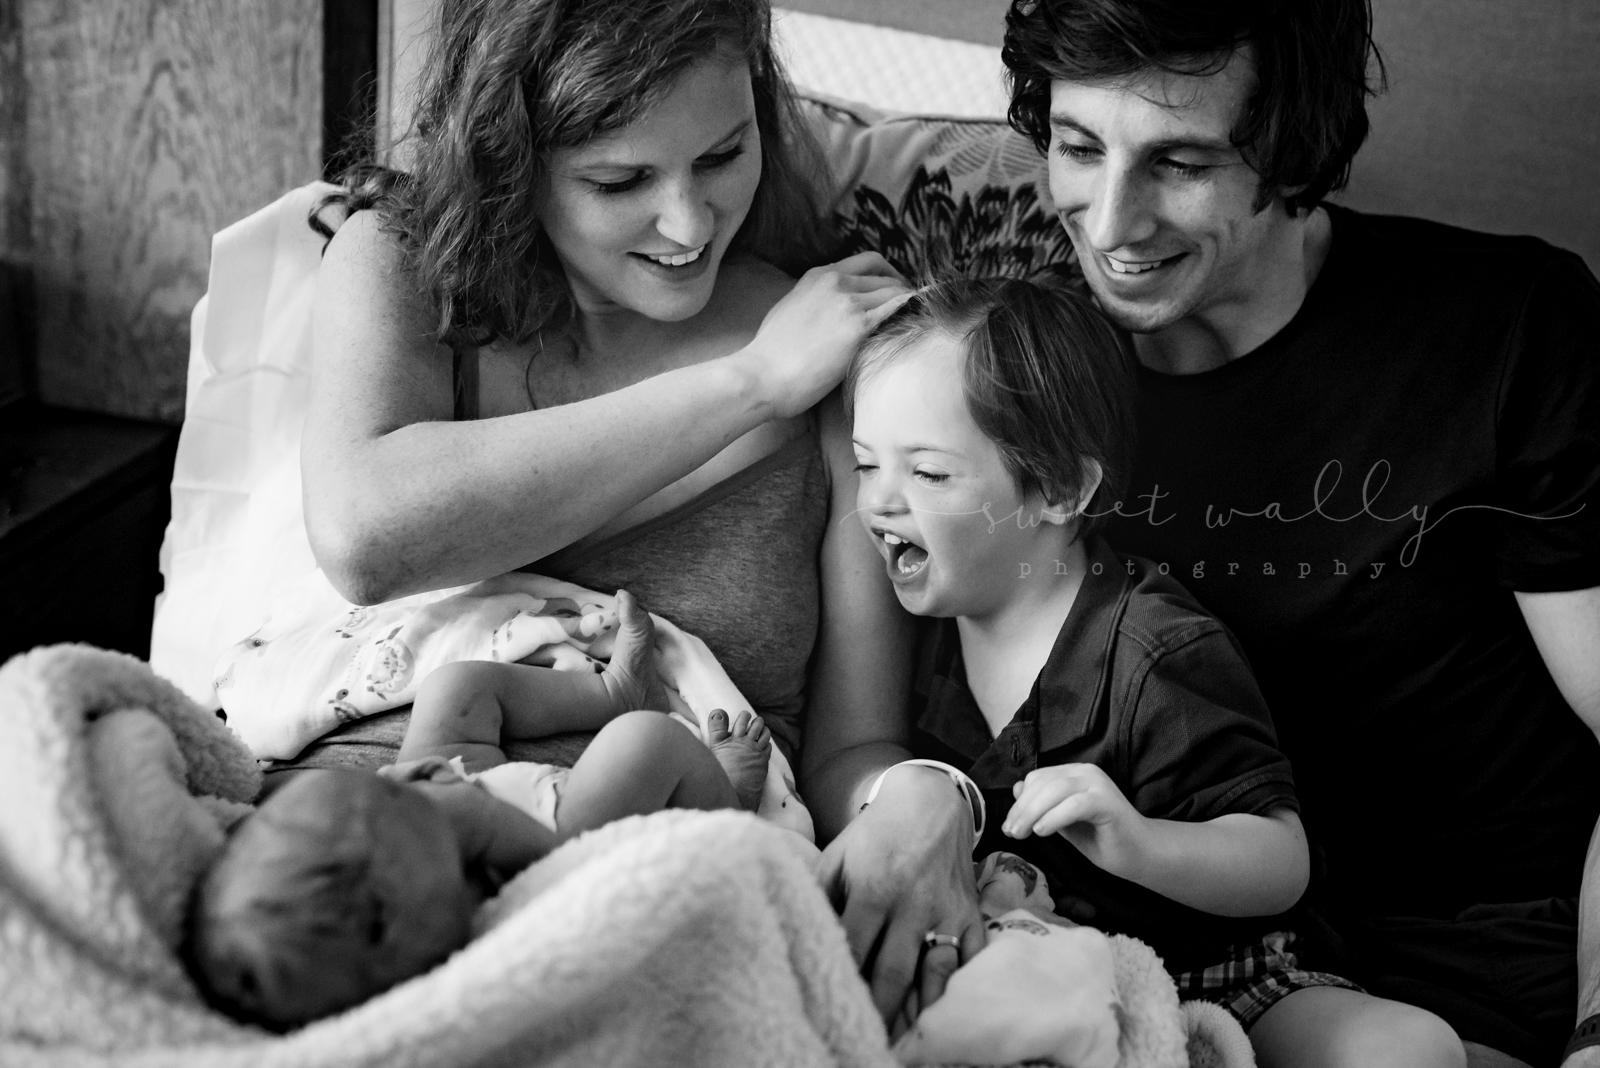 Pure big brother joy | Fresh 48 Newborn Session by Sweet Wally Photography | Nashville, TN